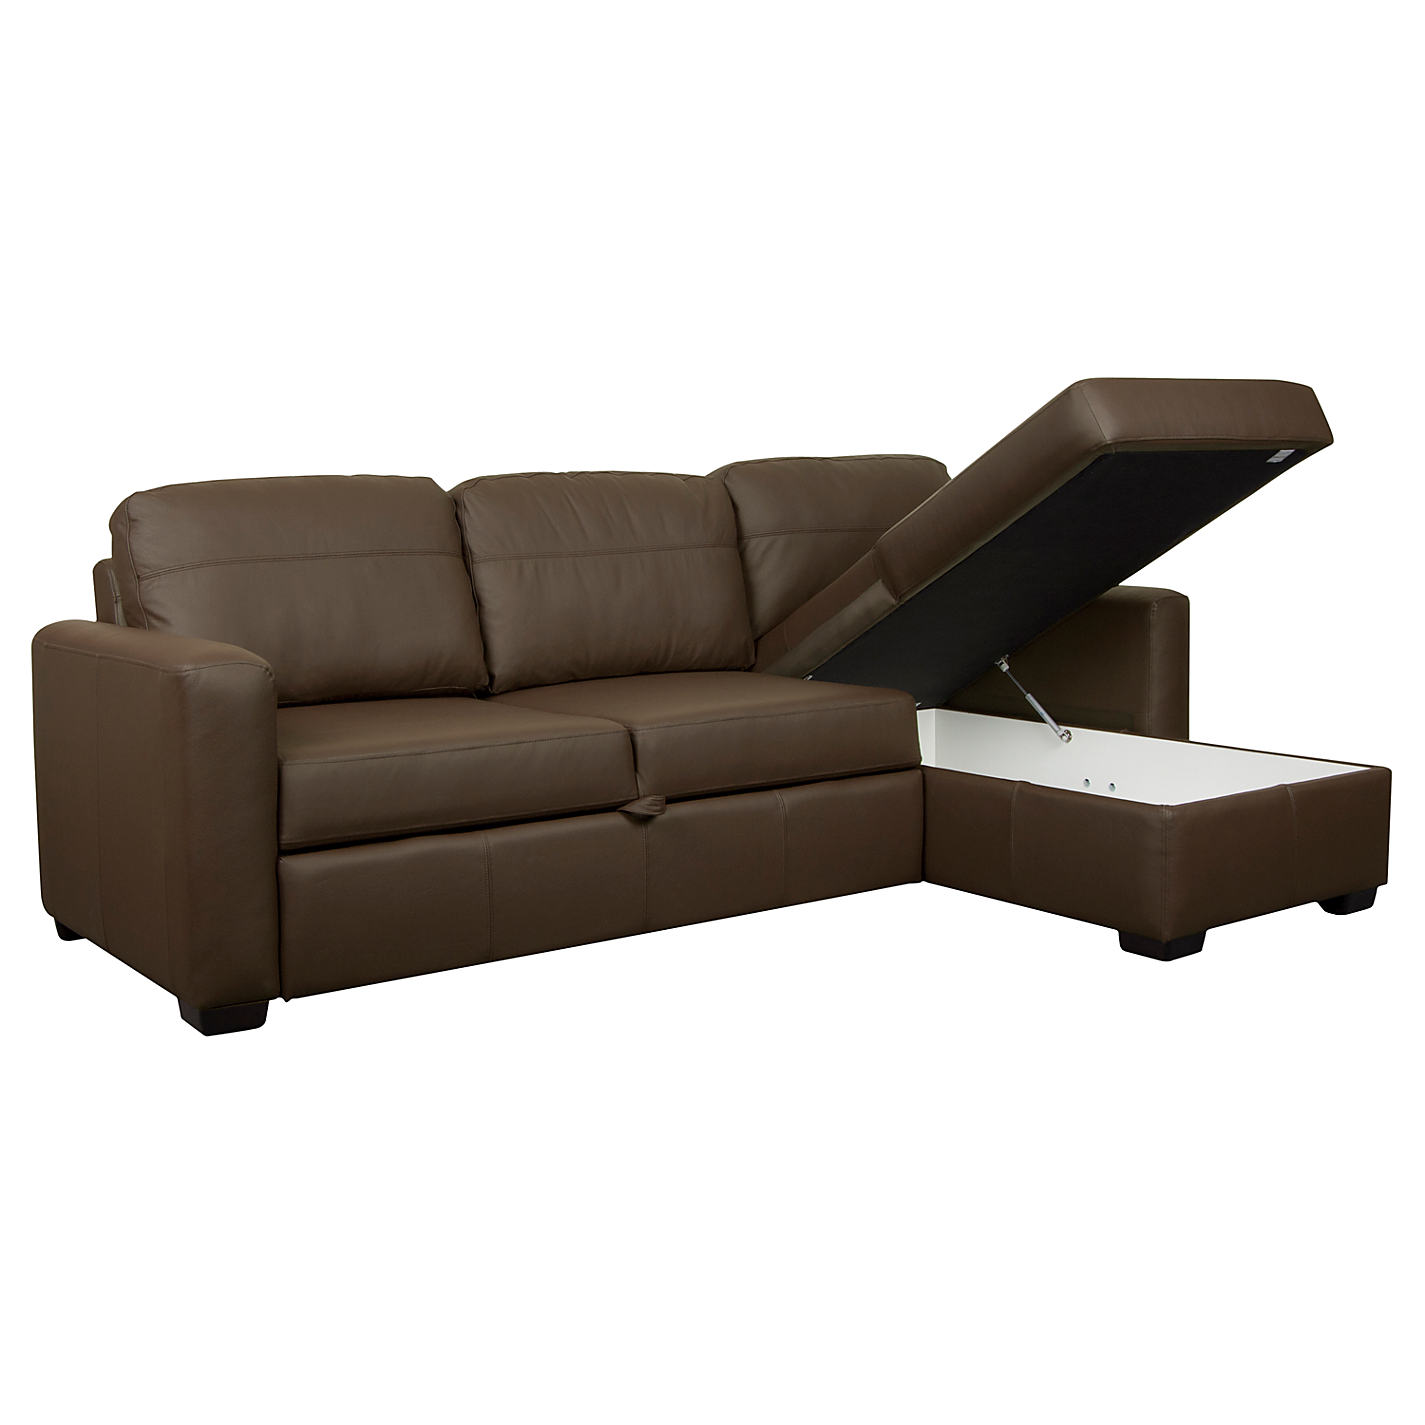 White Leather Sofa Bed John Lewis Nicesofa